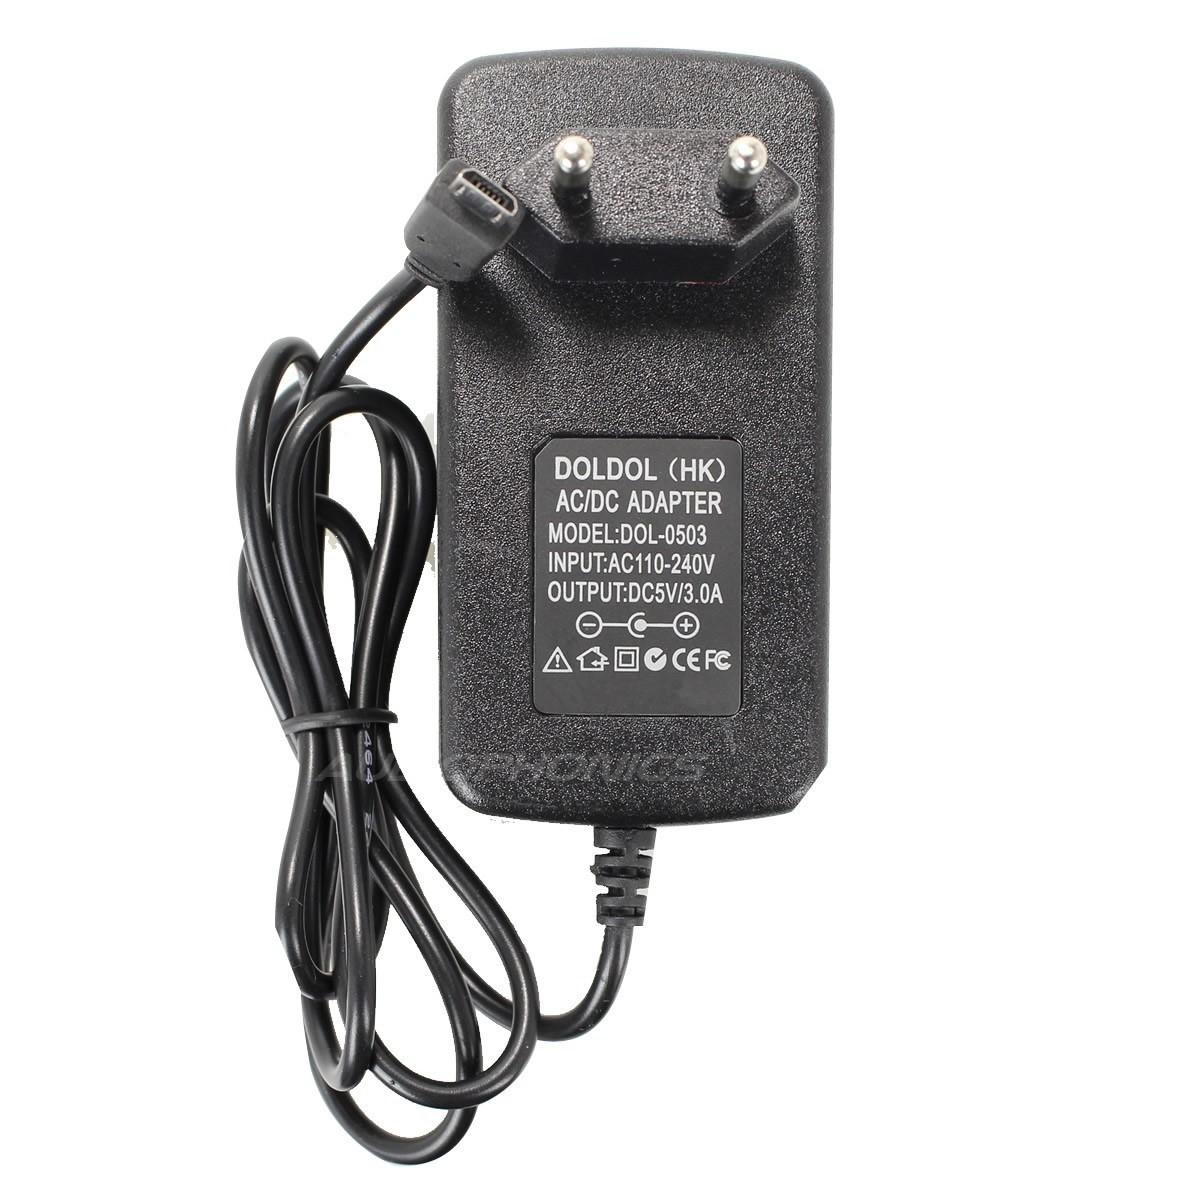 Adaptateur Secteur Micro USB Alimentation 110-240V vers 5V 3A Raspberry Pi 3B+